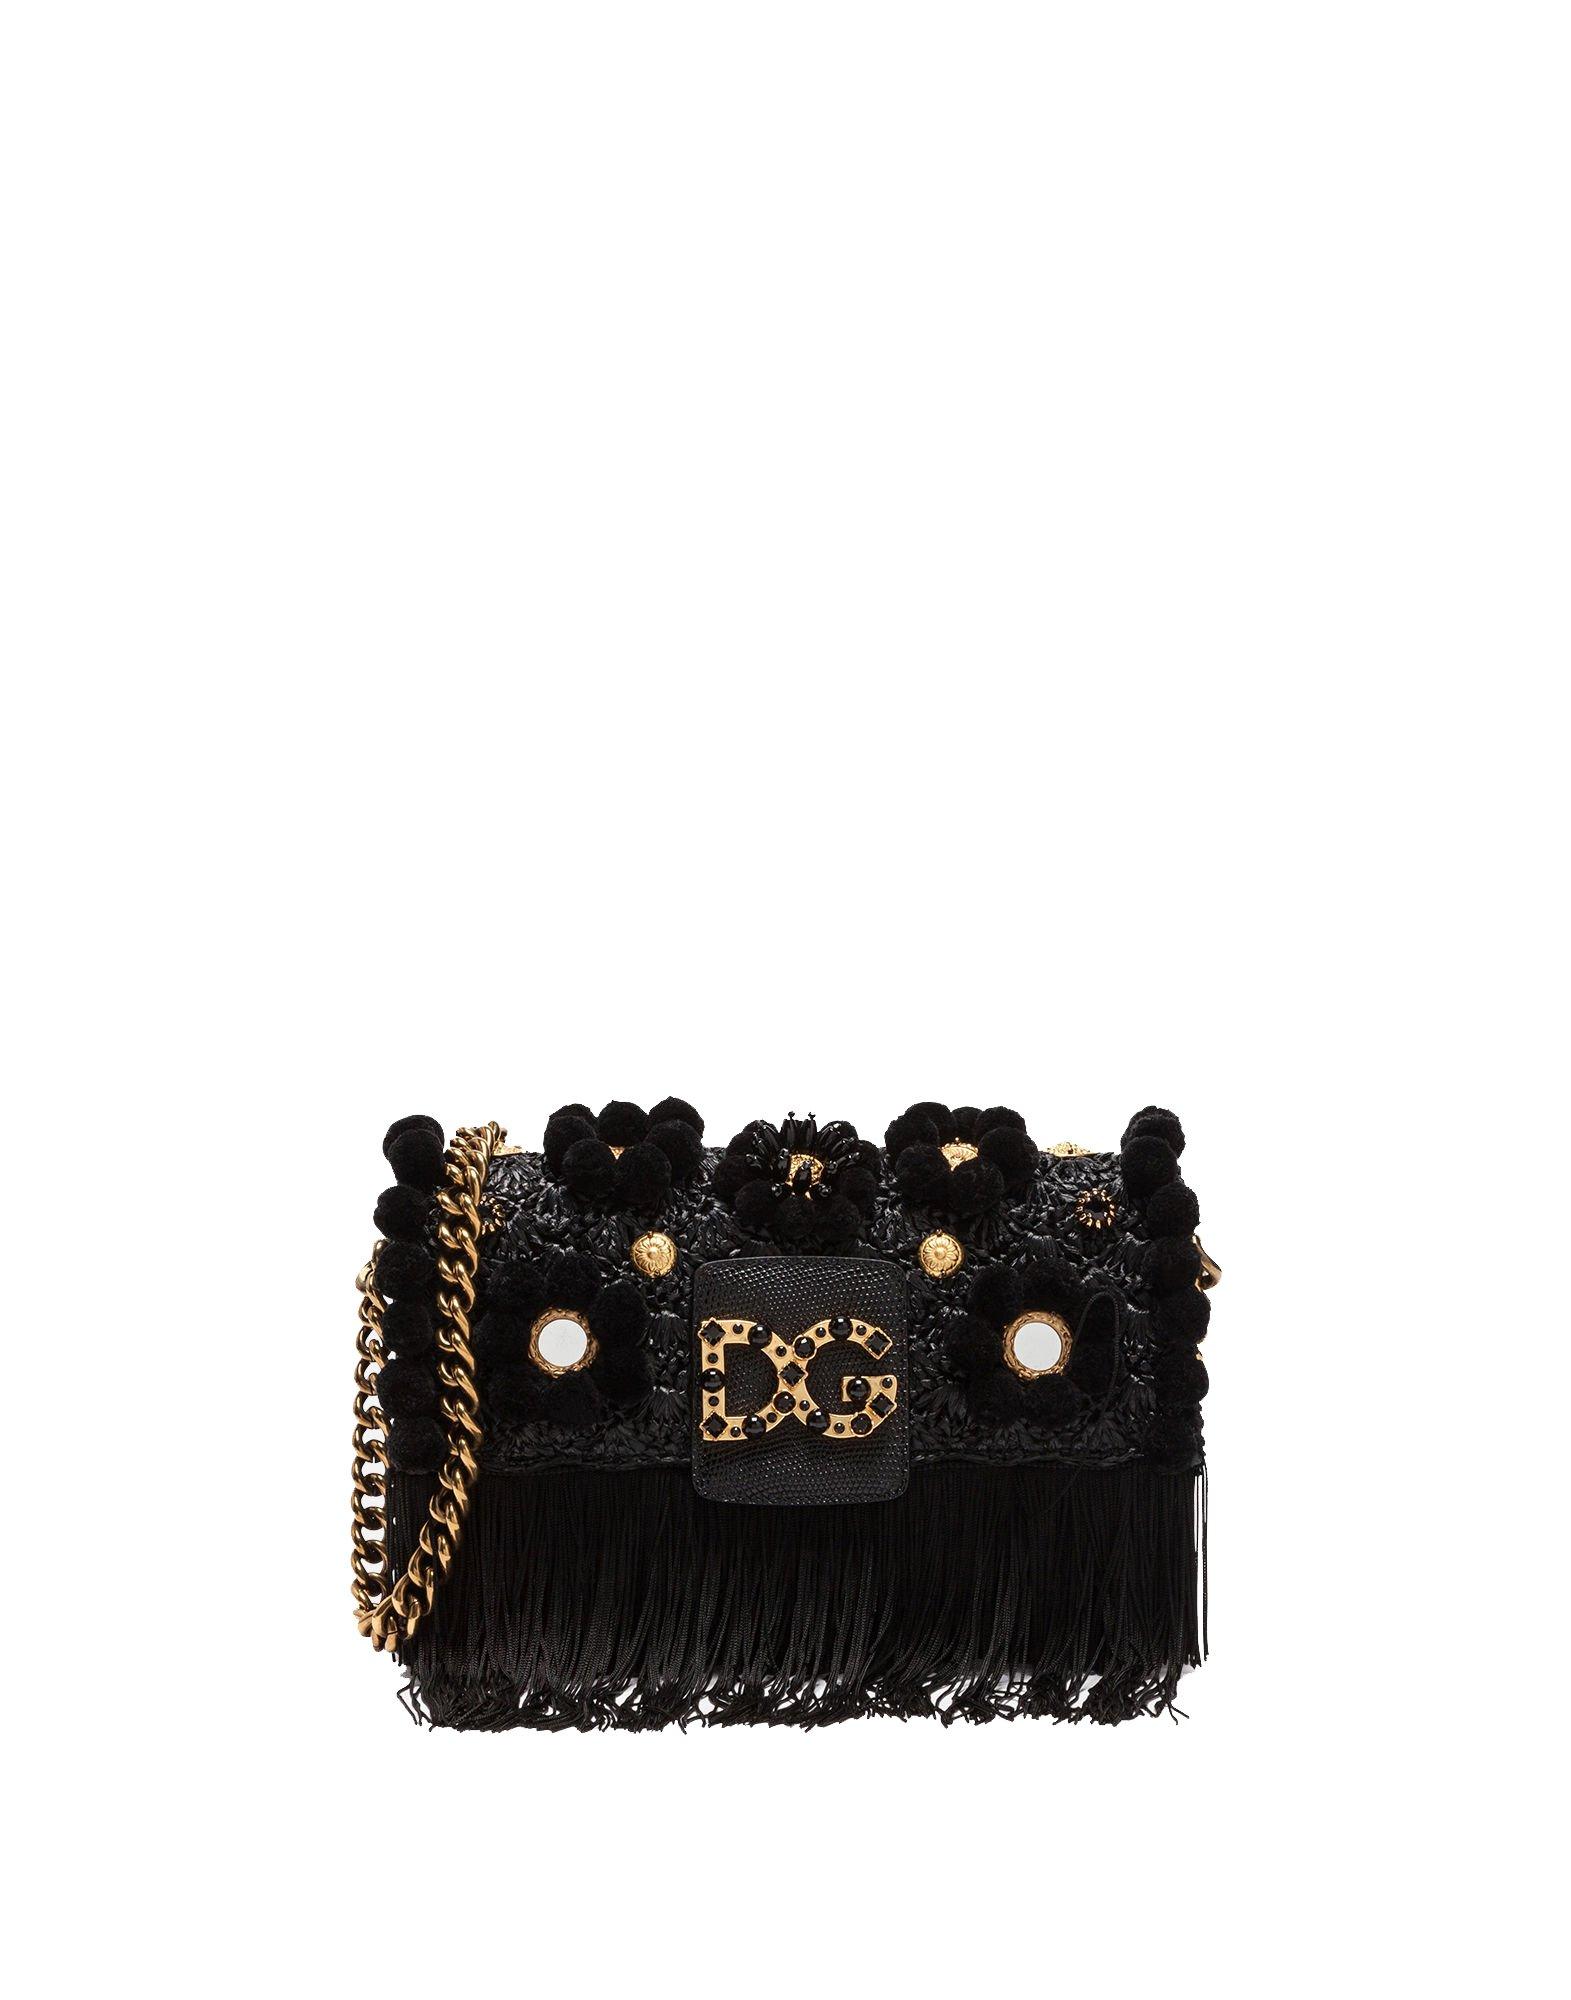 Dolce E Gabbana Women's Bb6393as9038b956 Black Leather Shoulder Bag by Dolce e Gabbana (Image #1)